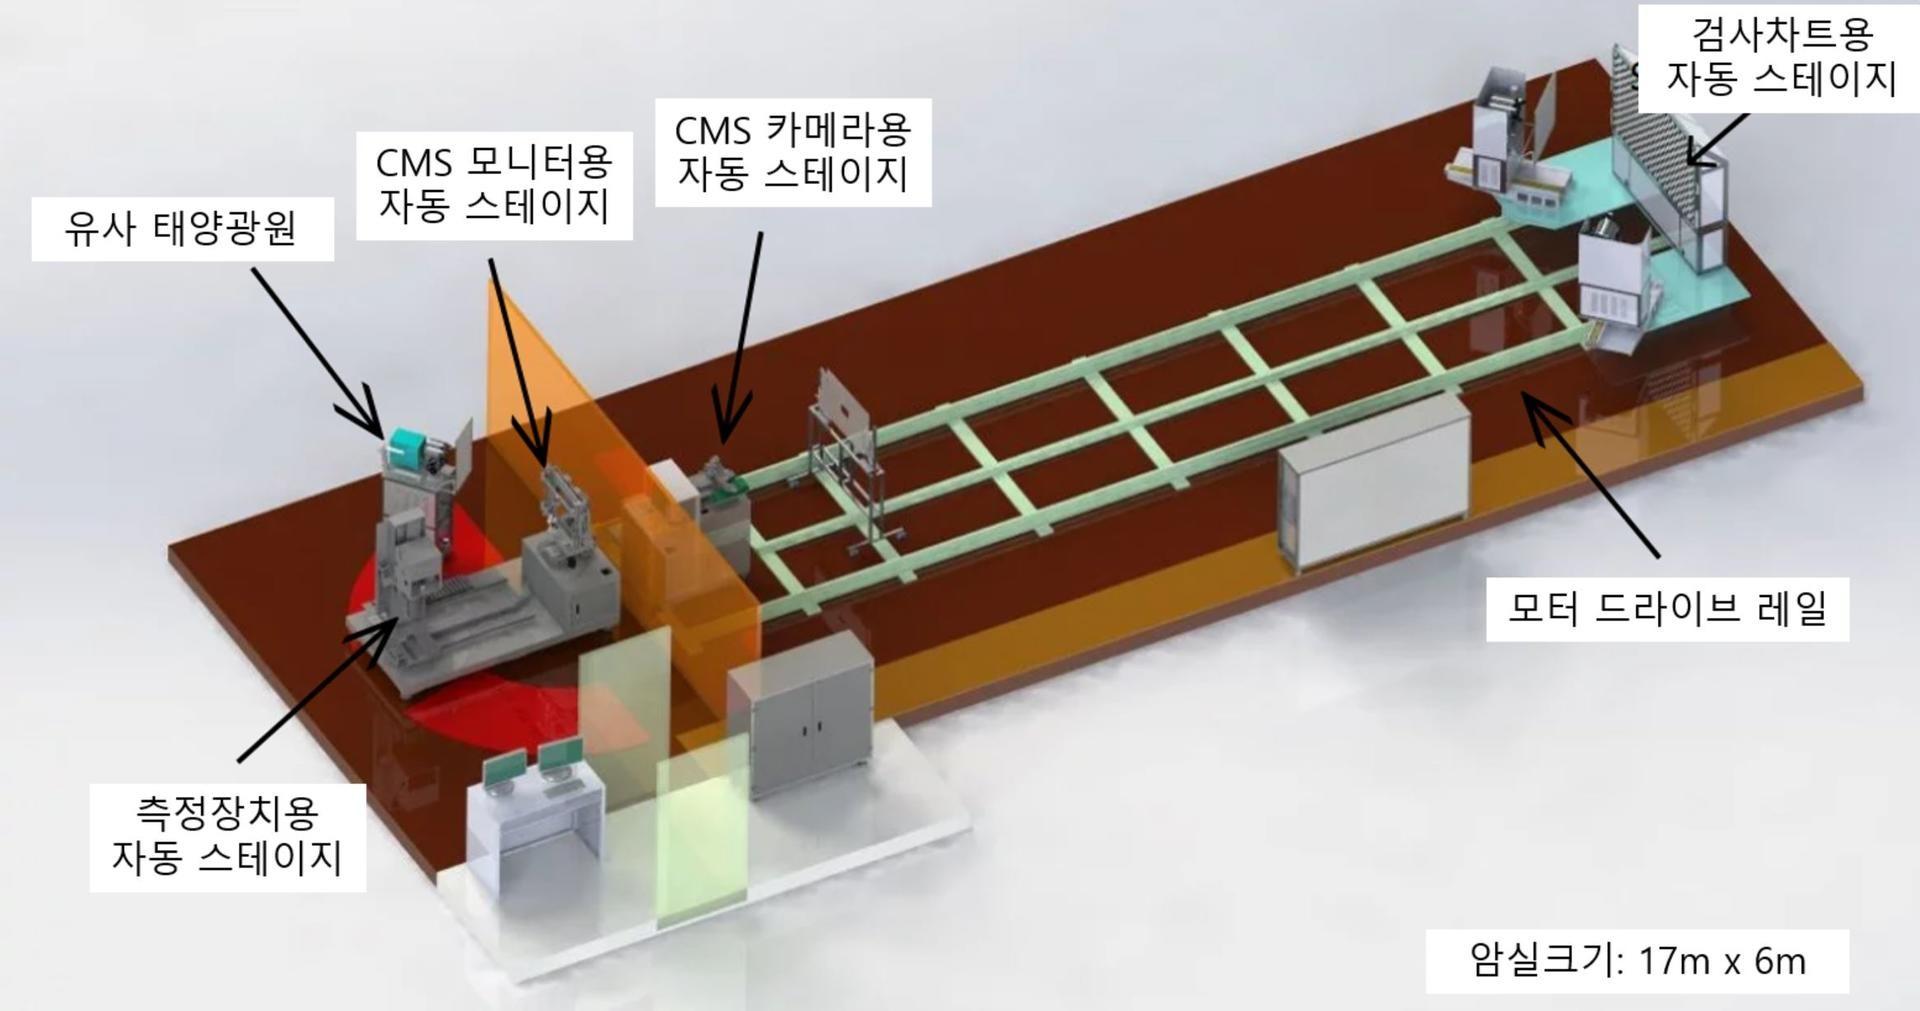 CMS 모듈 시스템 레이아웃 이미지